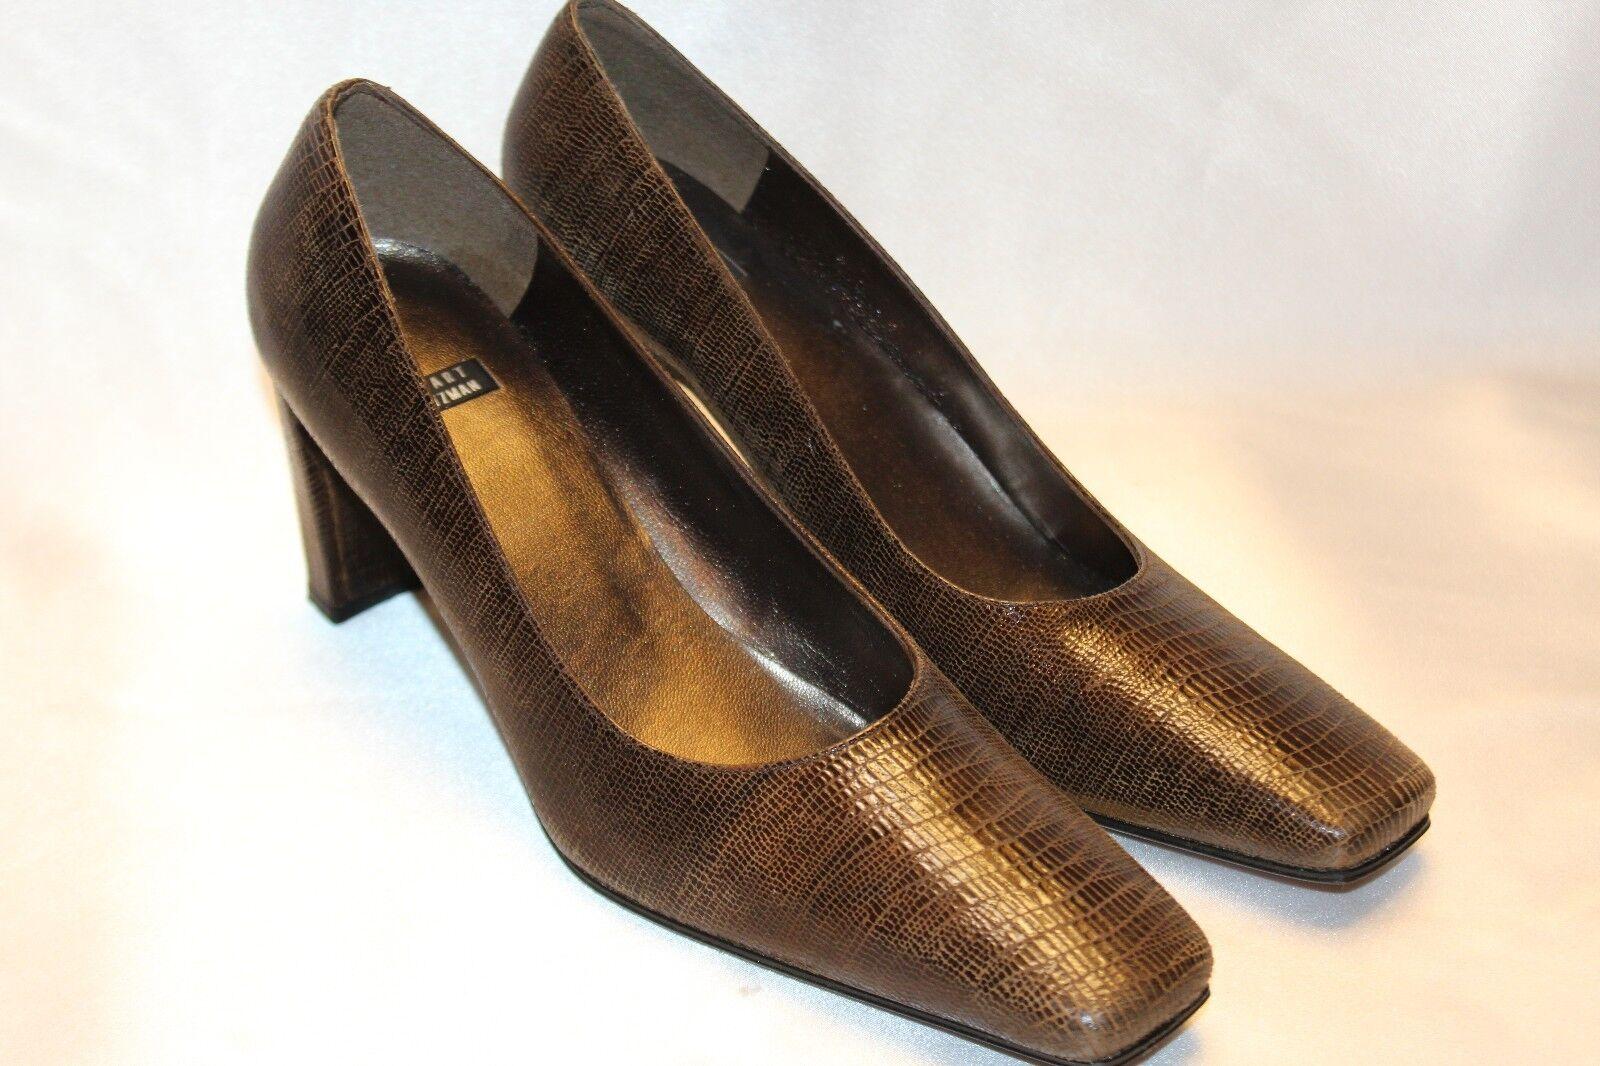 NEU  STUART WEITZMAN Braun Lizard Leder Square Toe Classic Heels Pumps 8.5 M